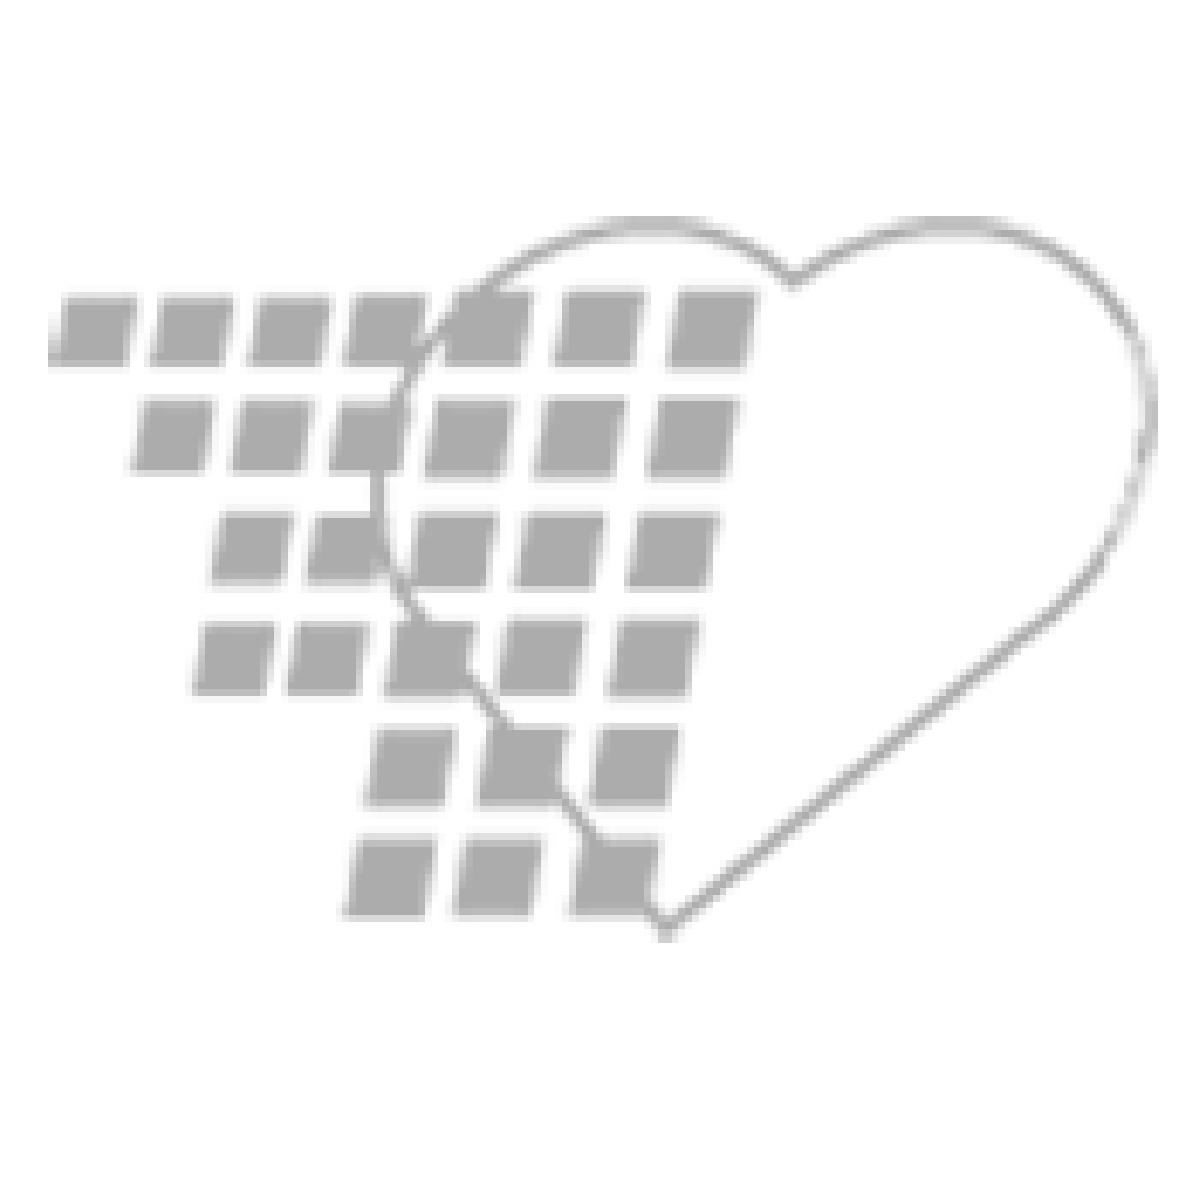 11-81-4041-WH Nasco Life/form® GERi™ and KERi™ Optional Pressure Ulcer Foot